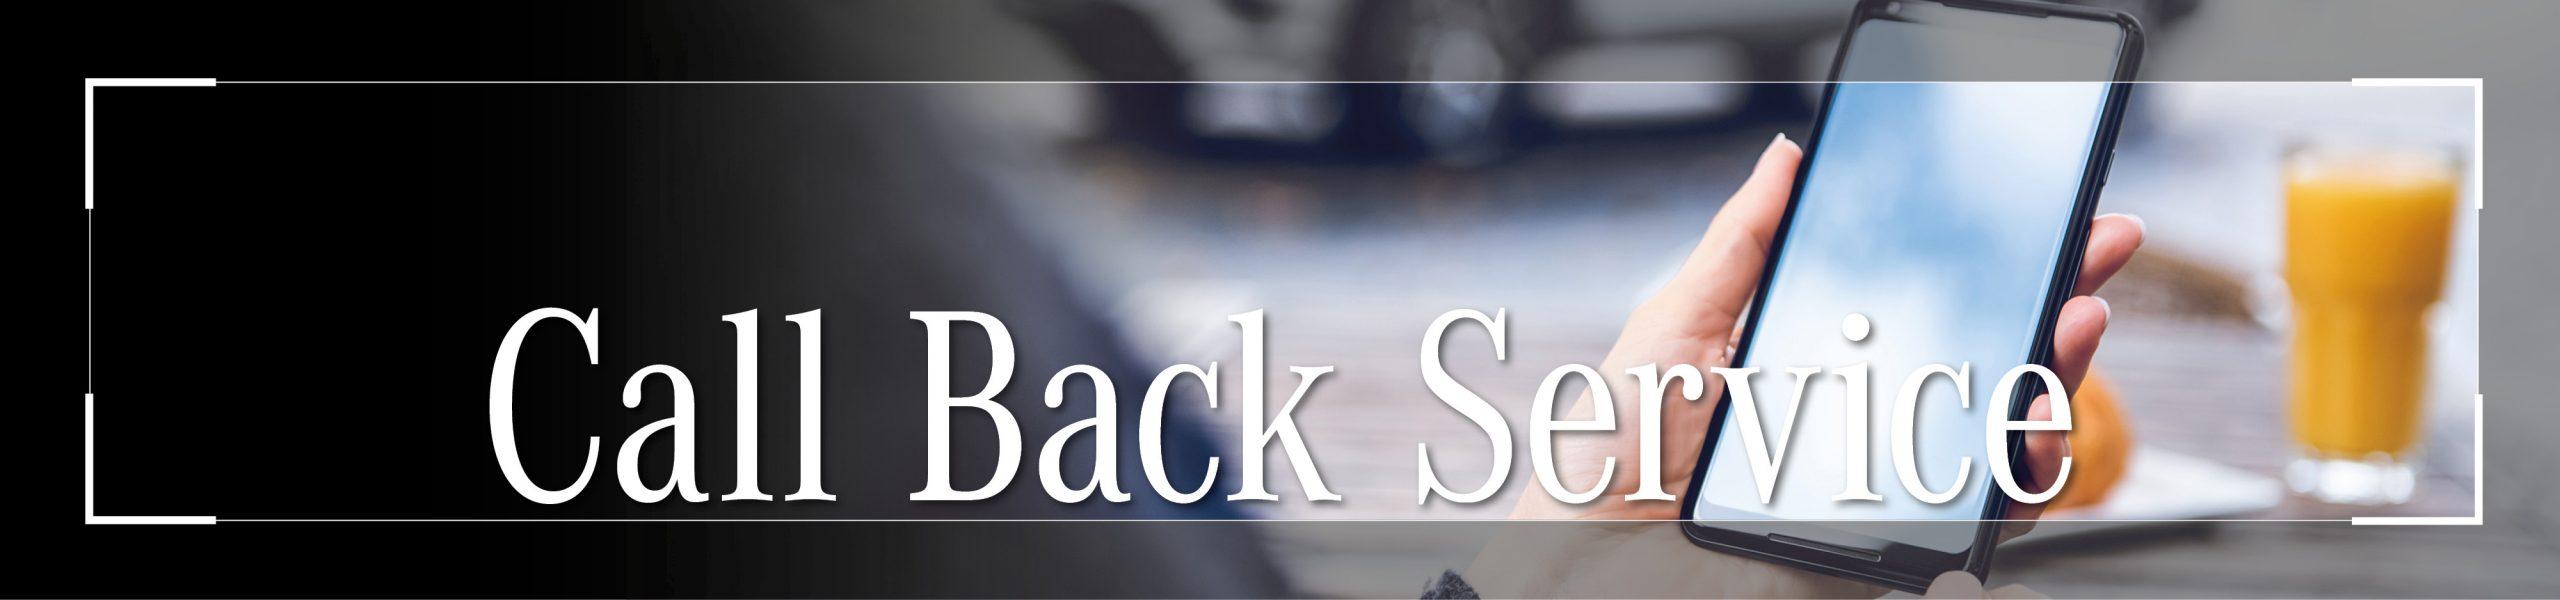 CallBackService0621_1920x450px